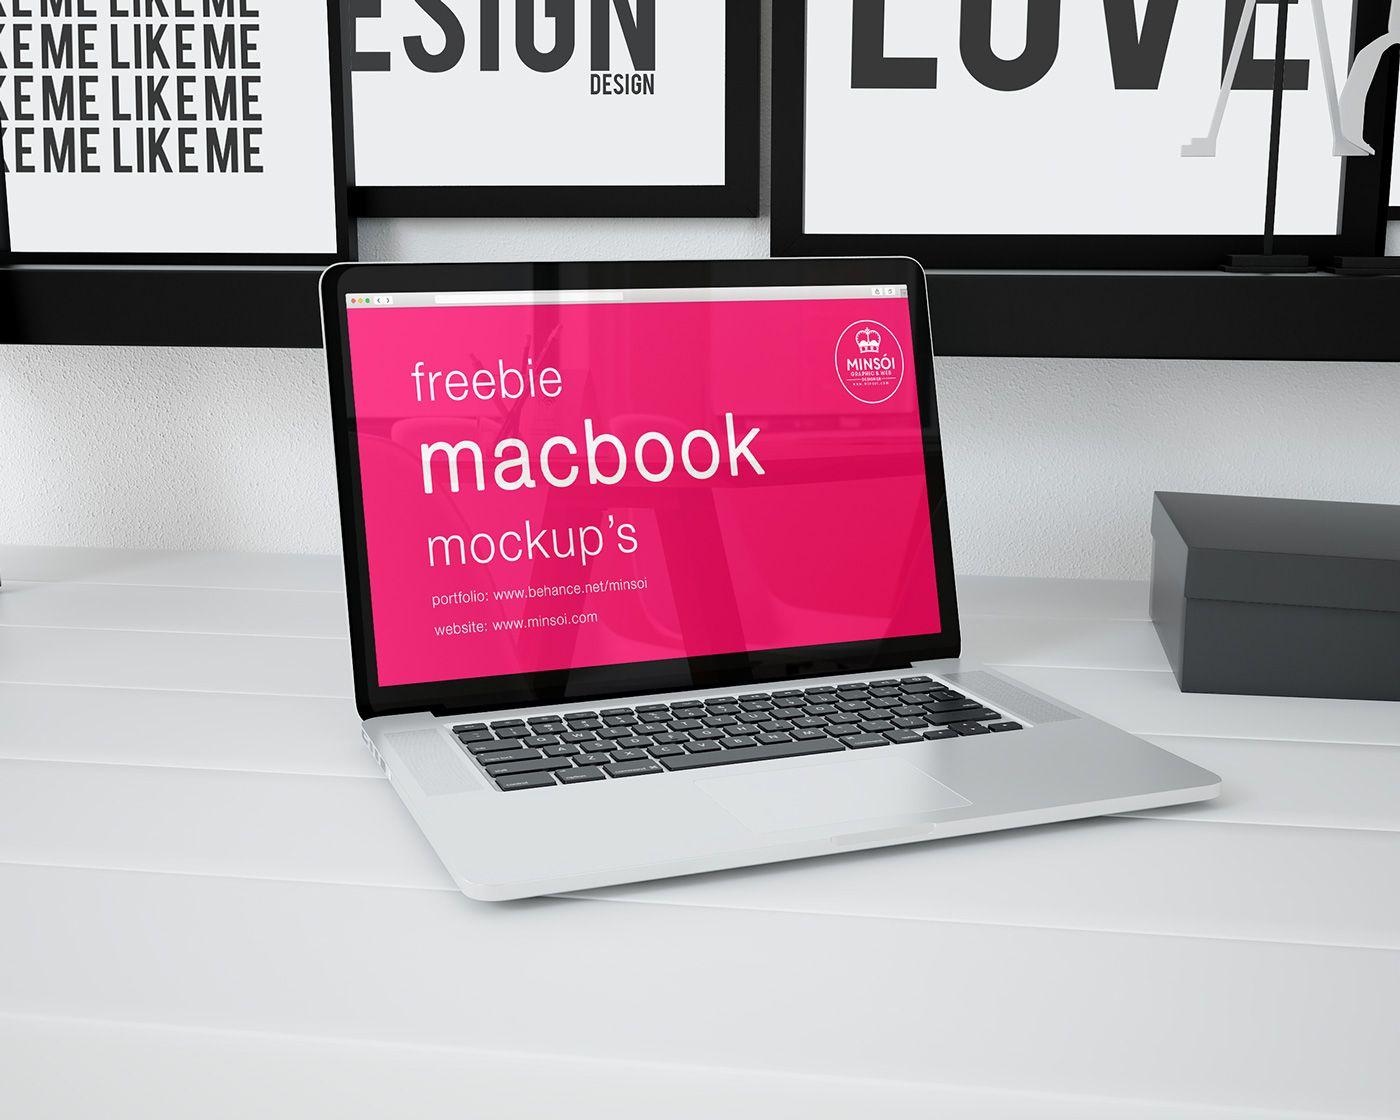 Mockup macbook